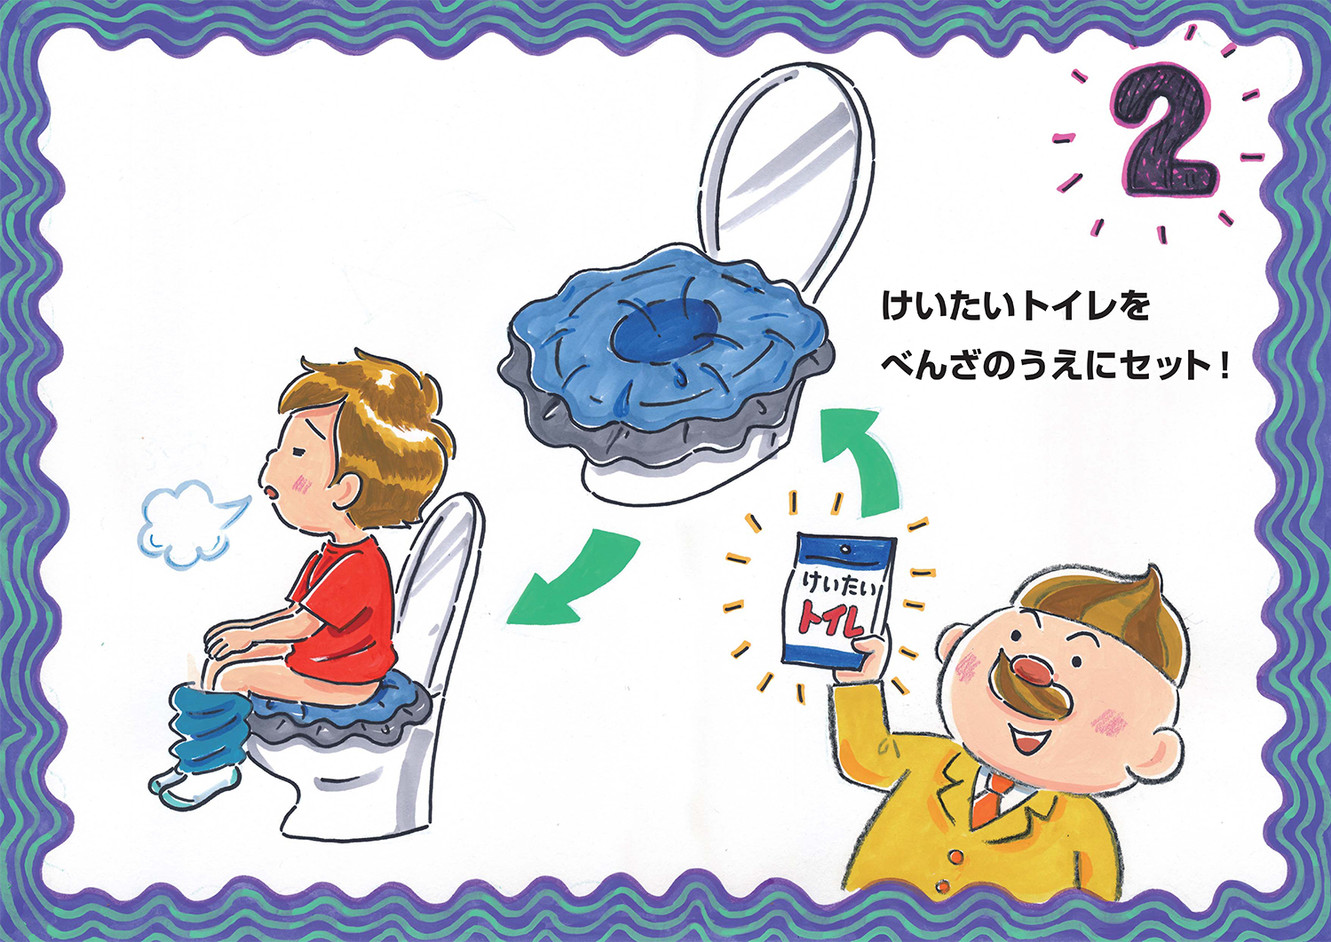 kanaweb_toiletkamishibai_017.jpg